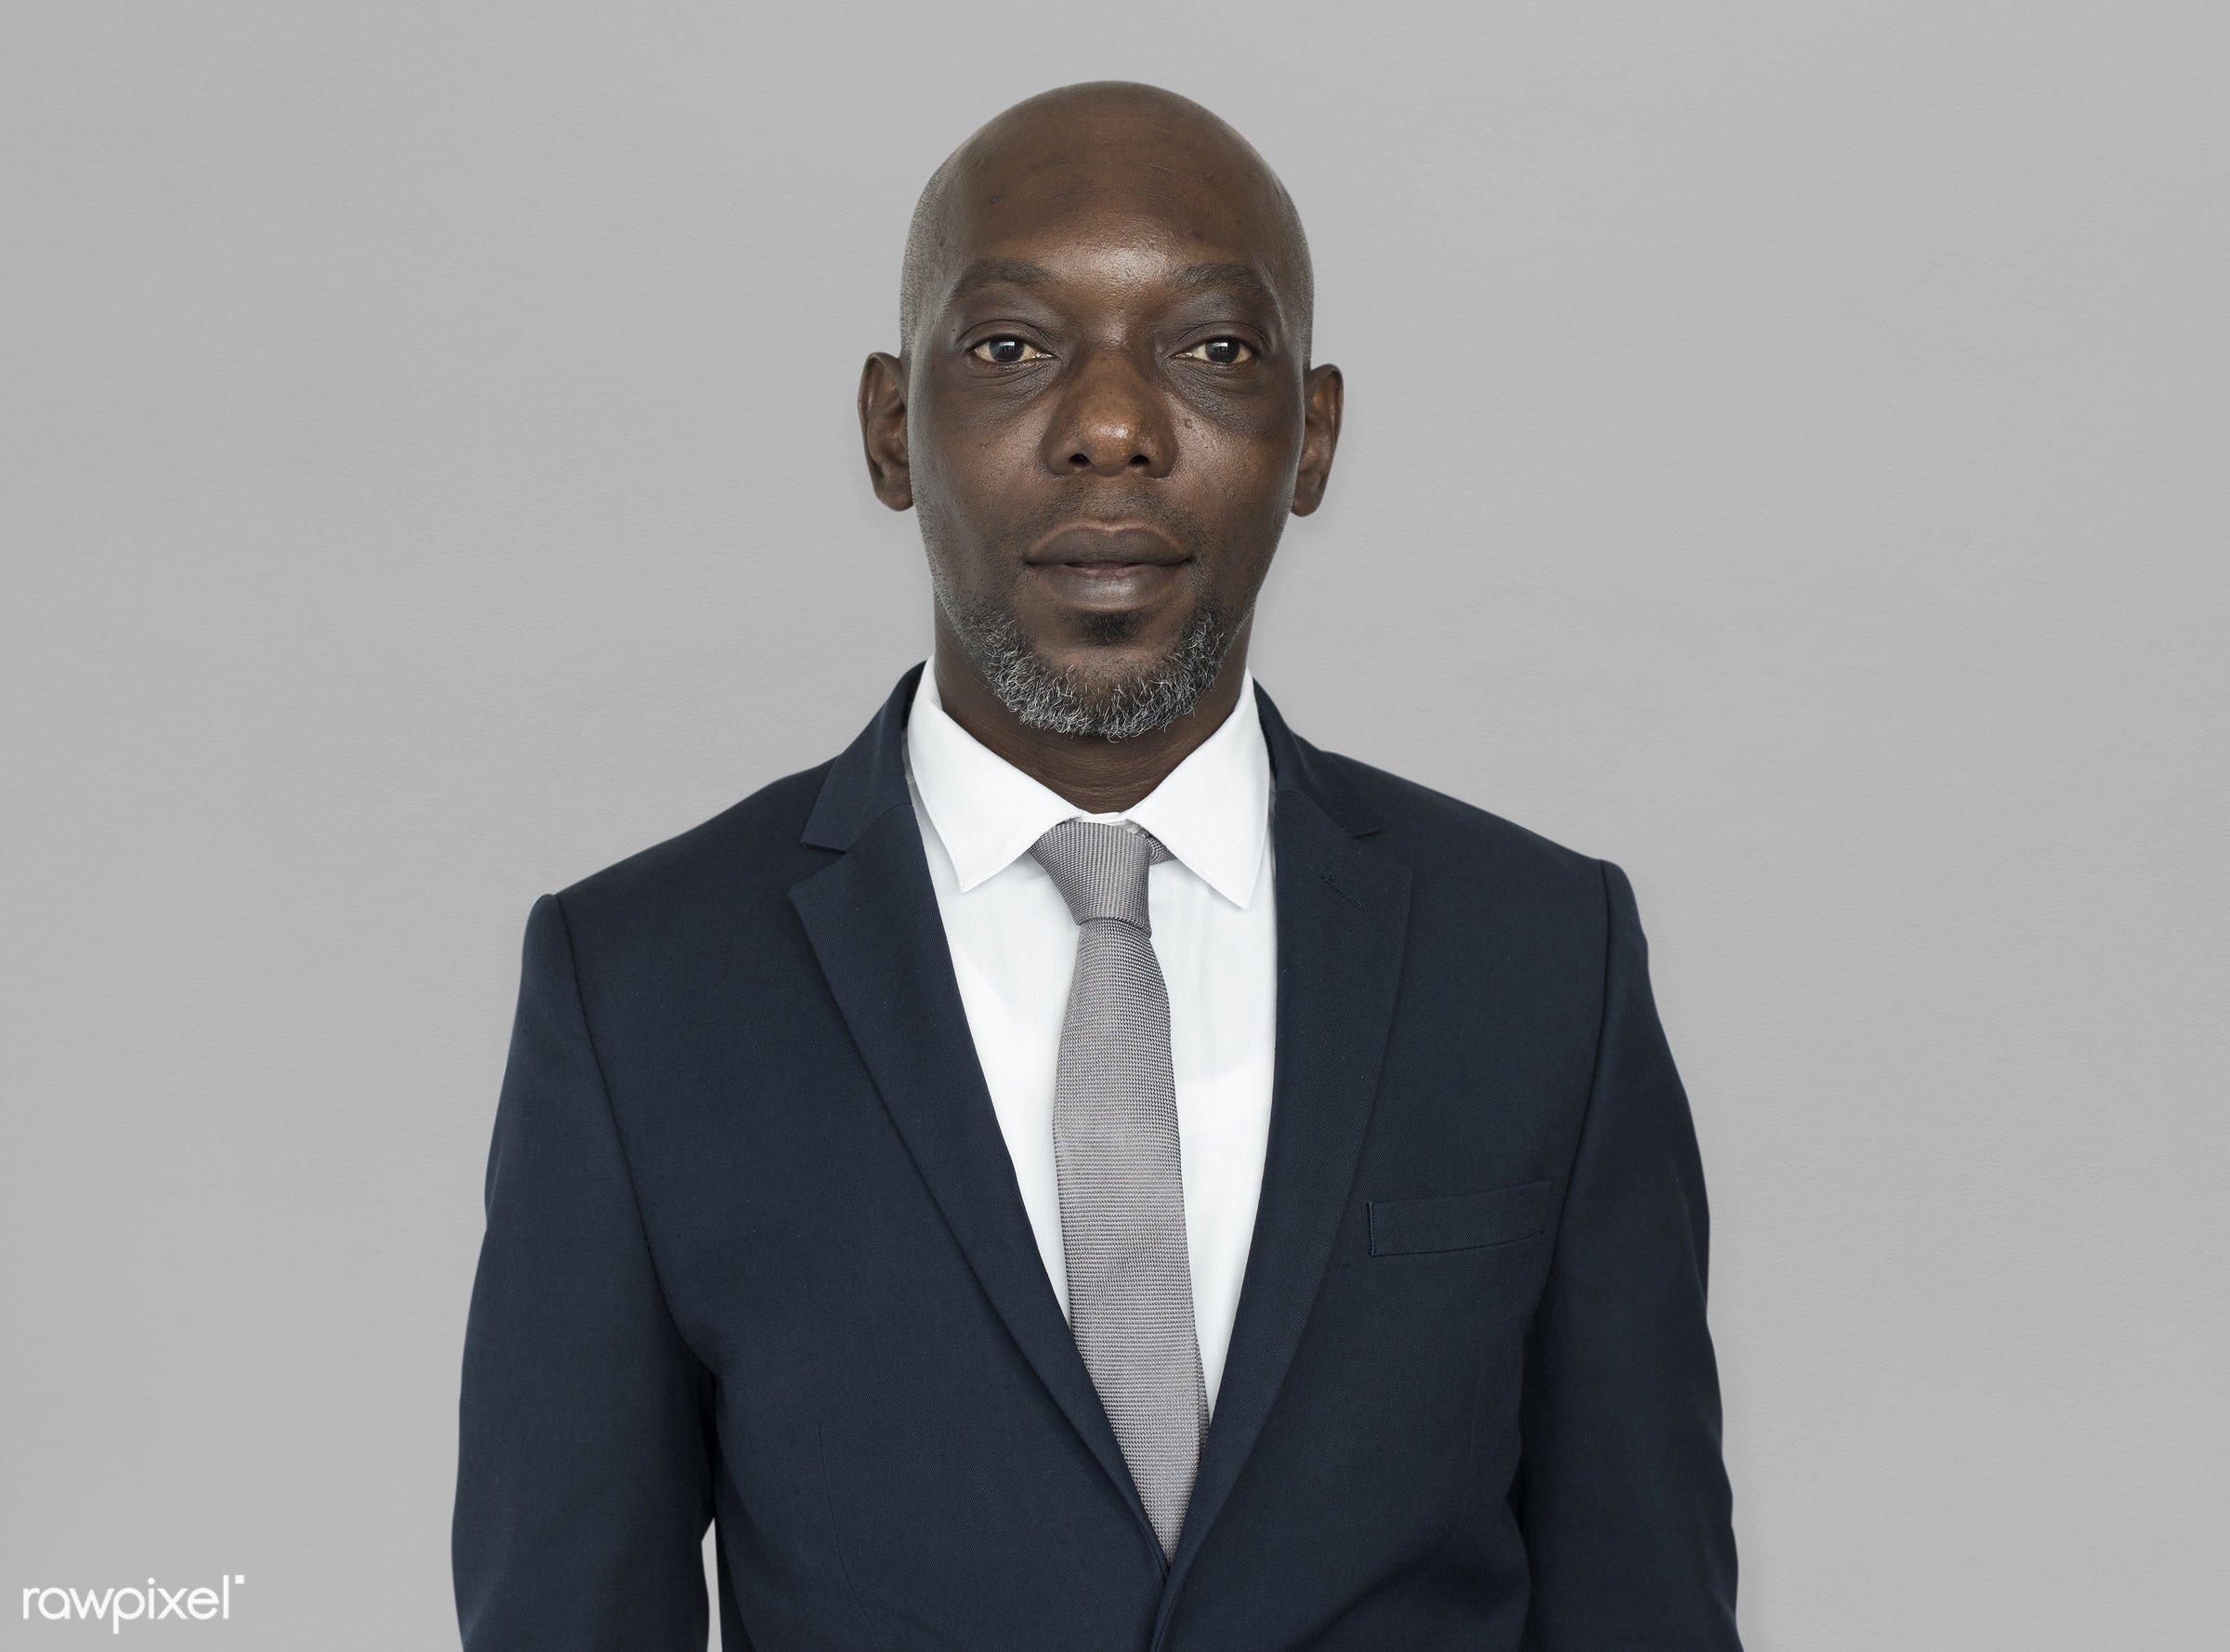 black, african, african american, man, male, professional, suit, tie, business, portrait